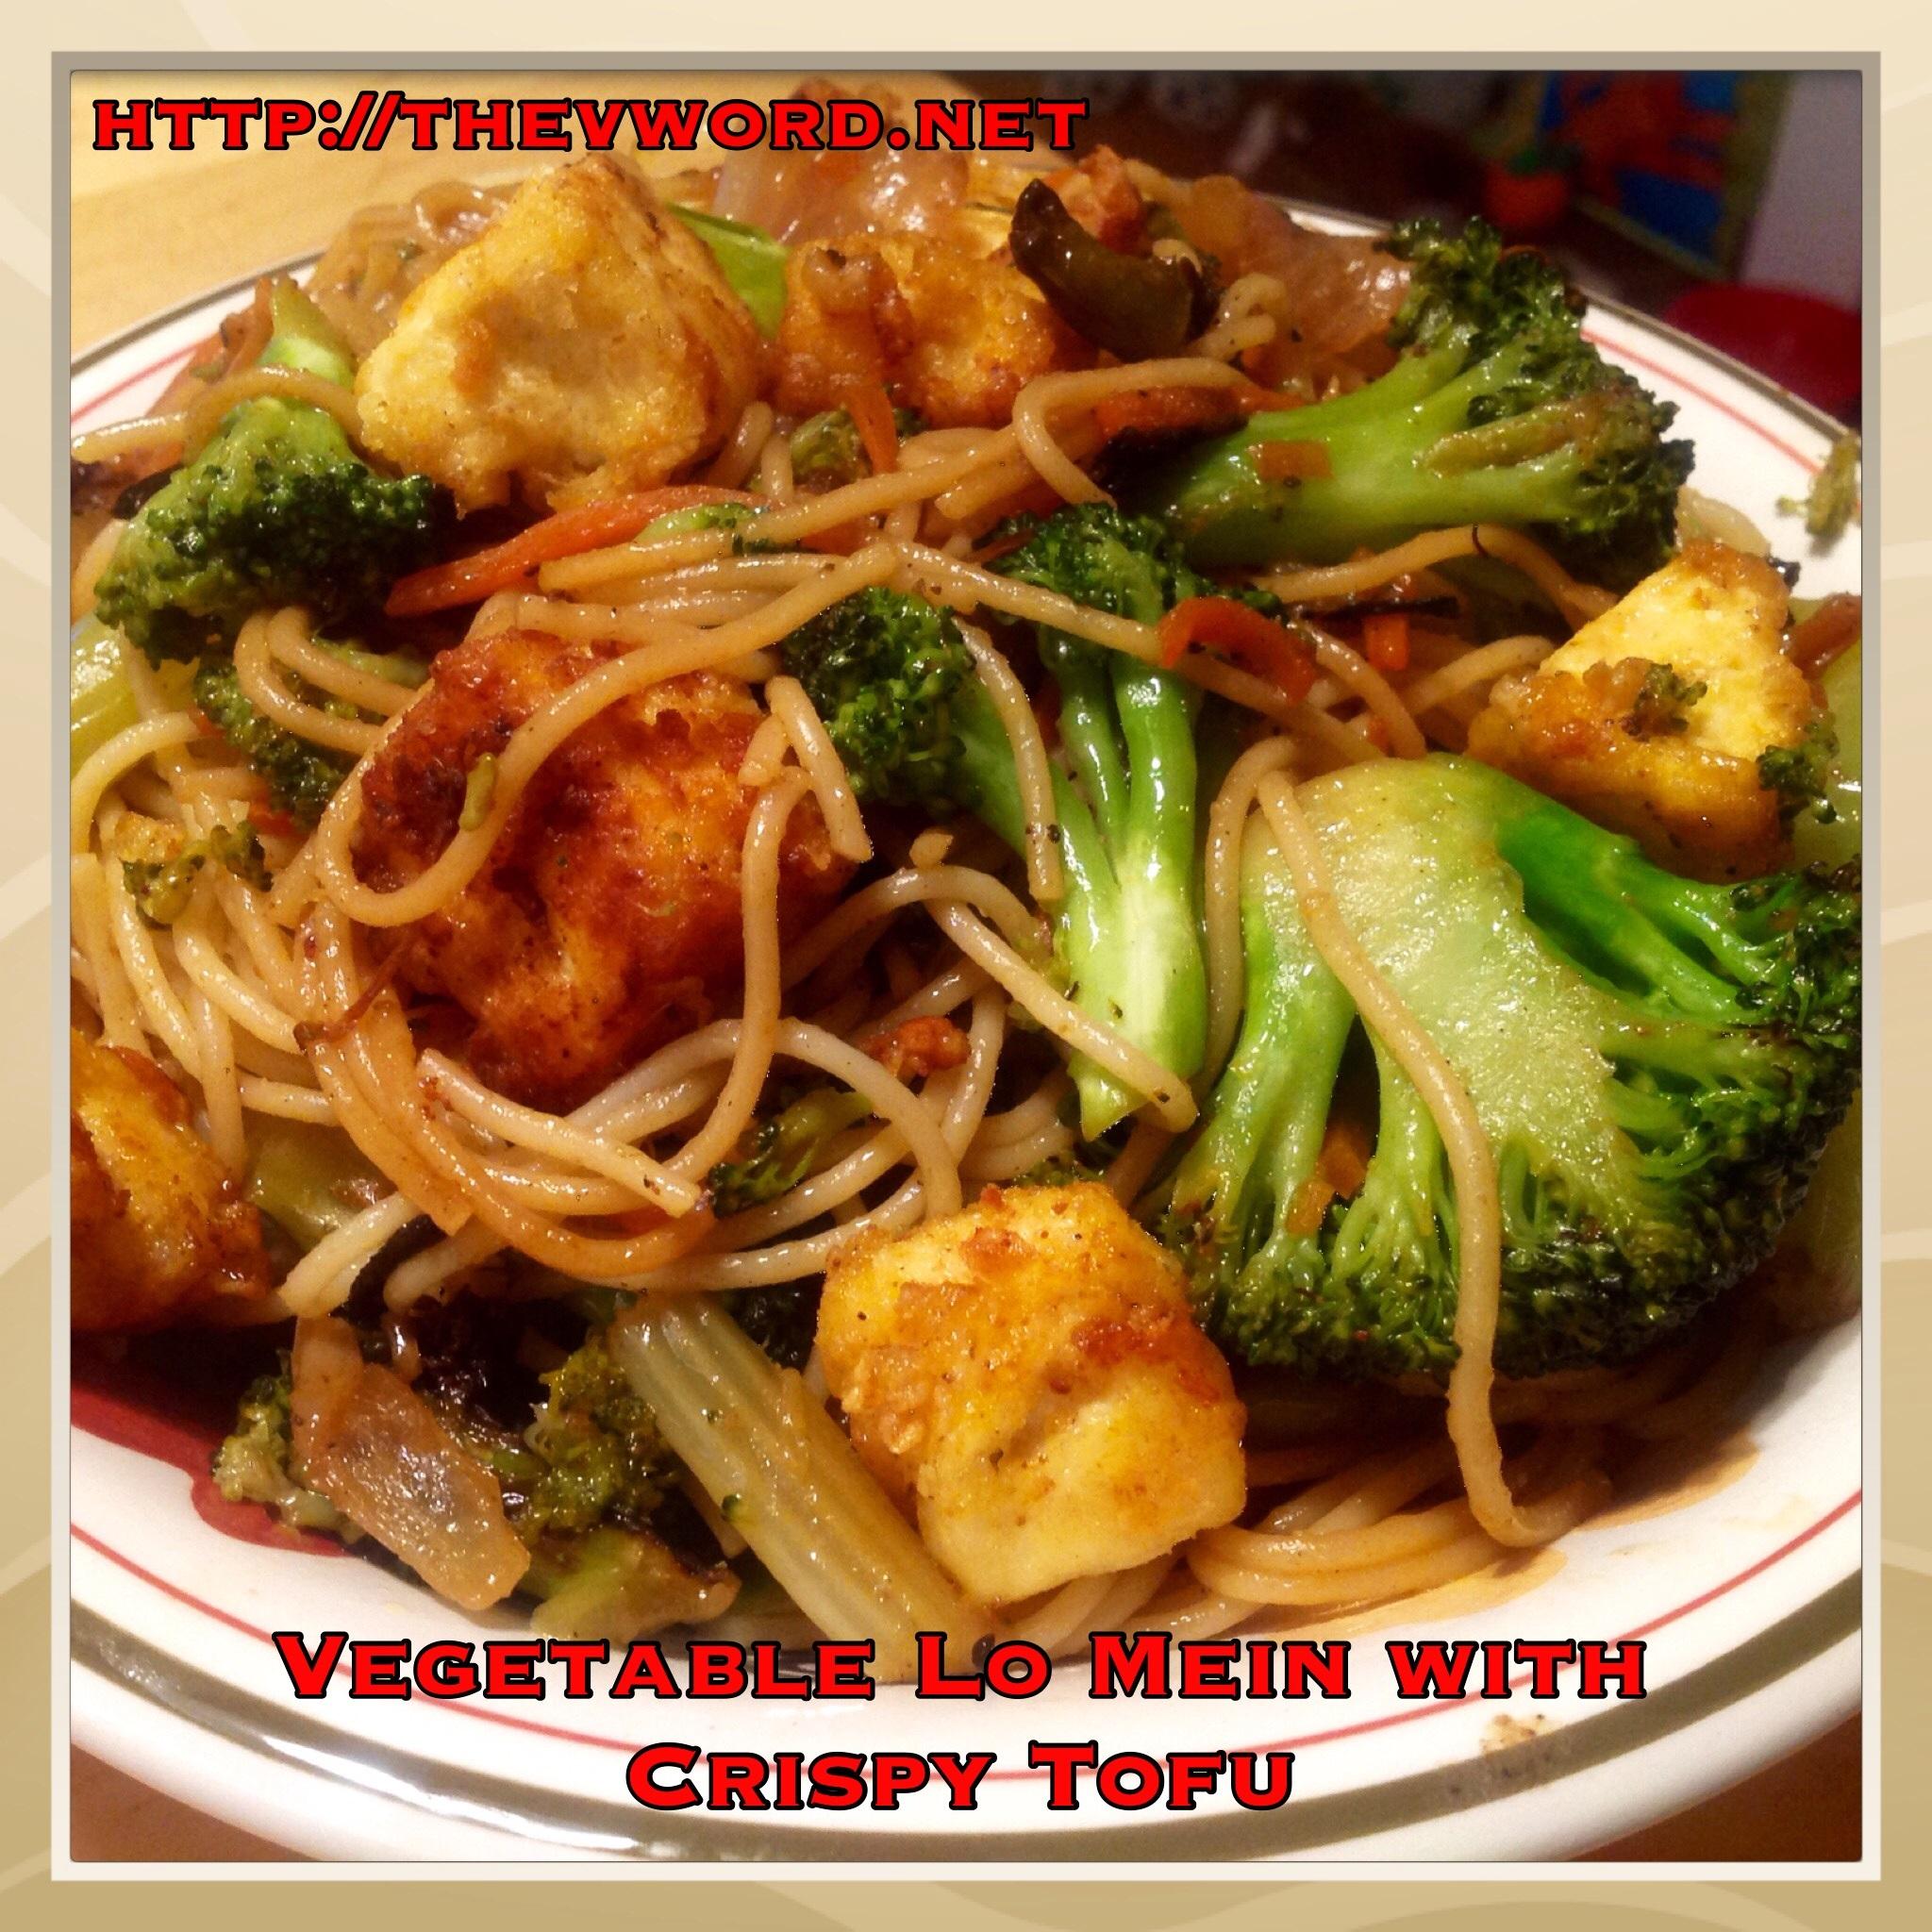 Vegetable lo mein with crispy tofu the secret to crispy tofu and vegetable lo mein with crispy tofu forumfinder Images